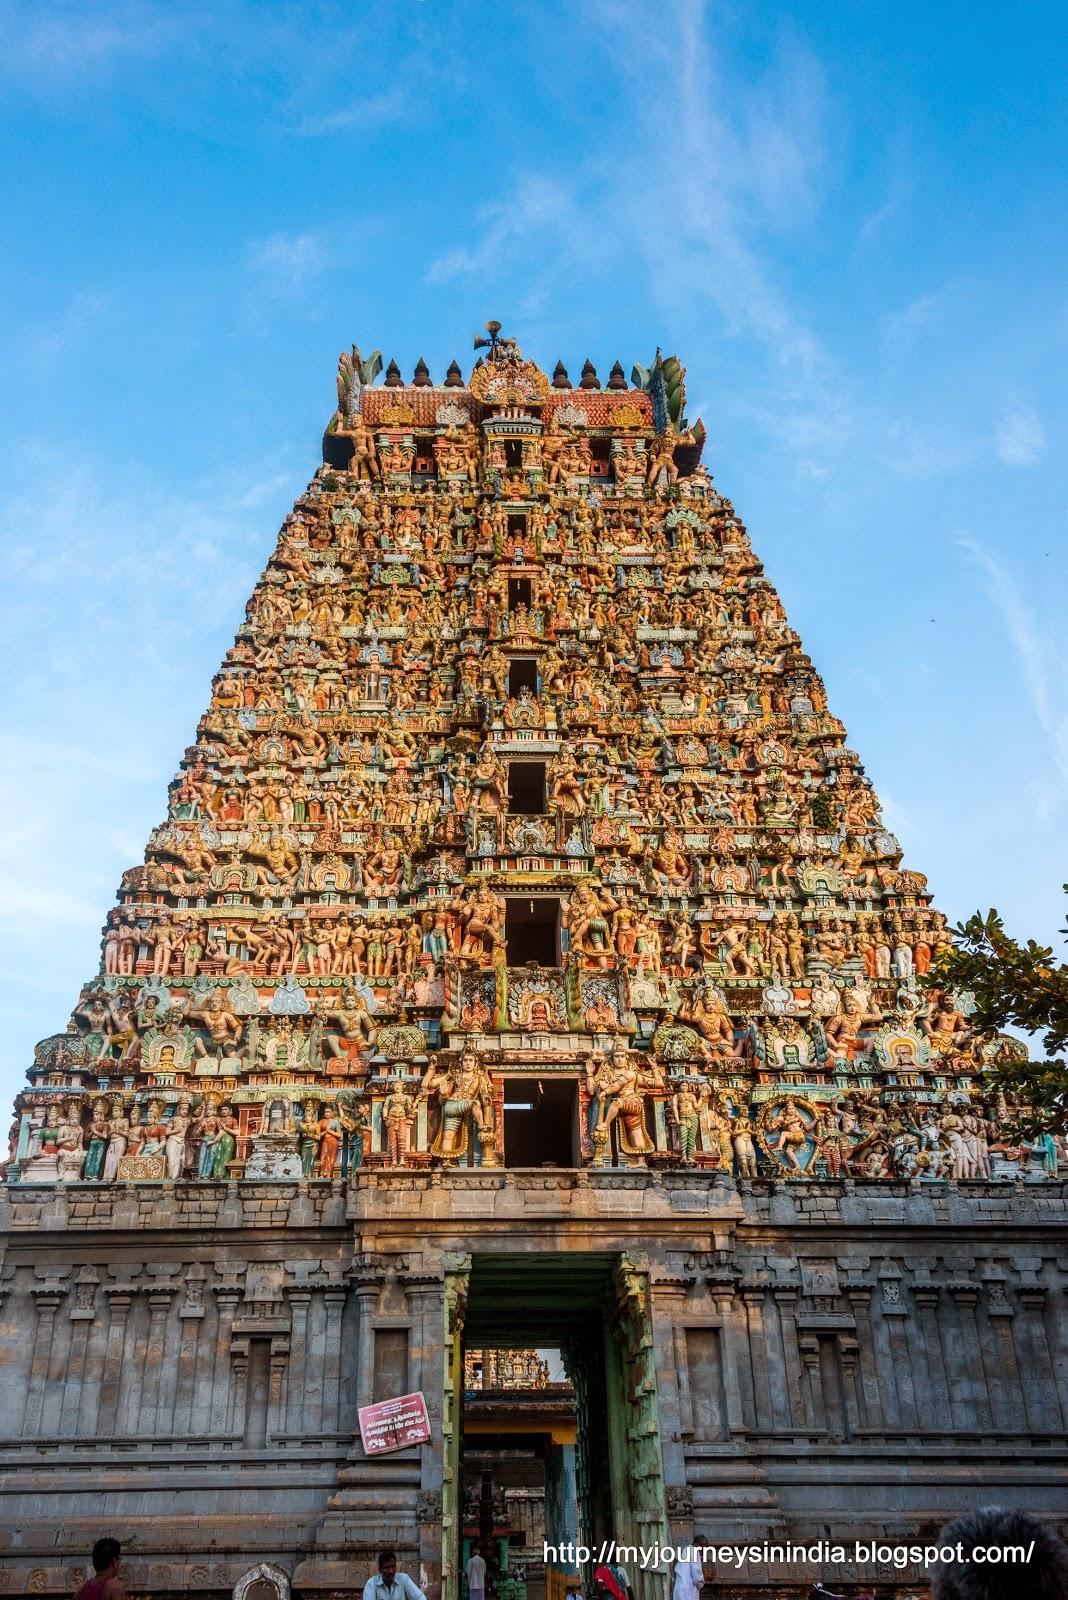 Thiruppanandal ArunaJadeswarar Temple Tower